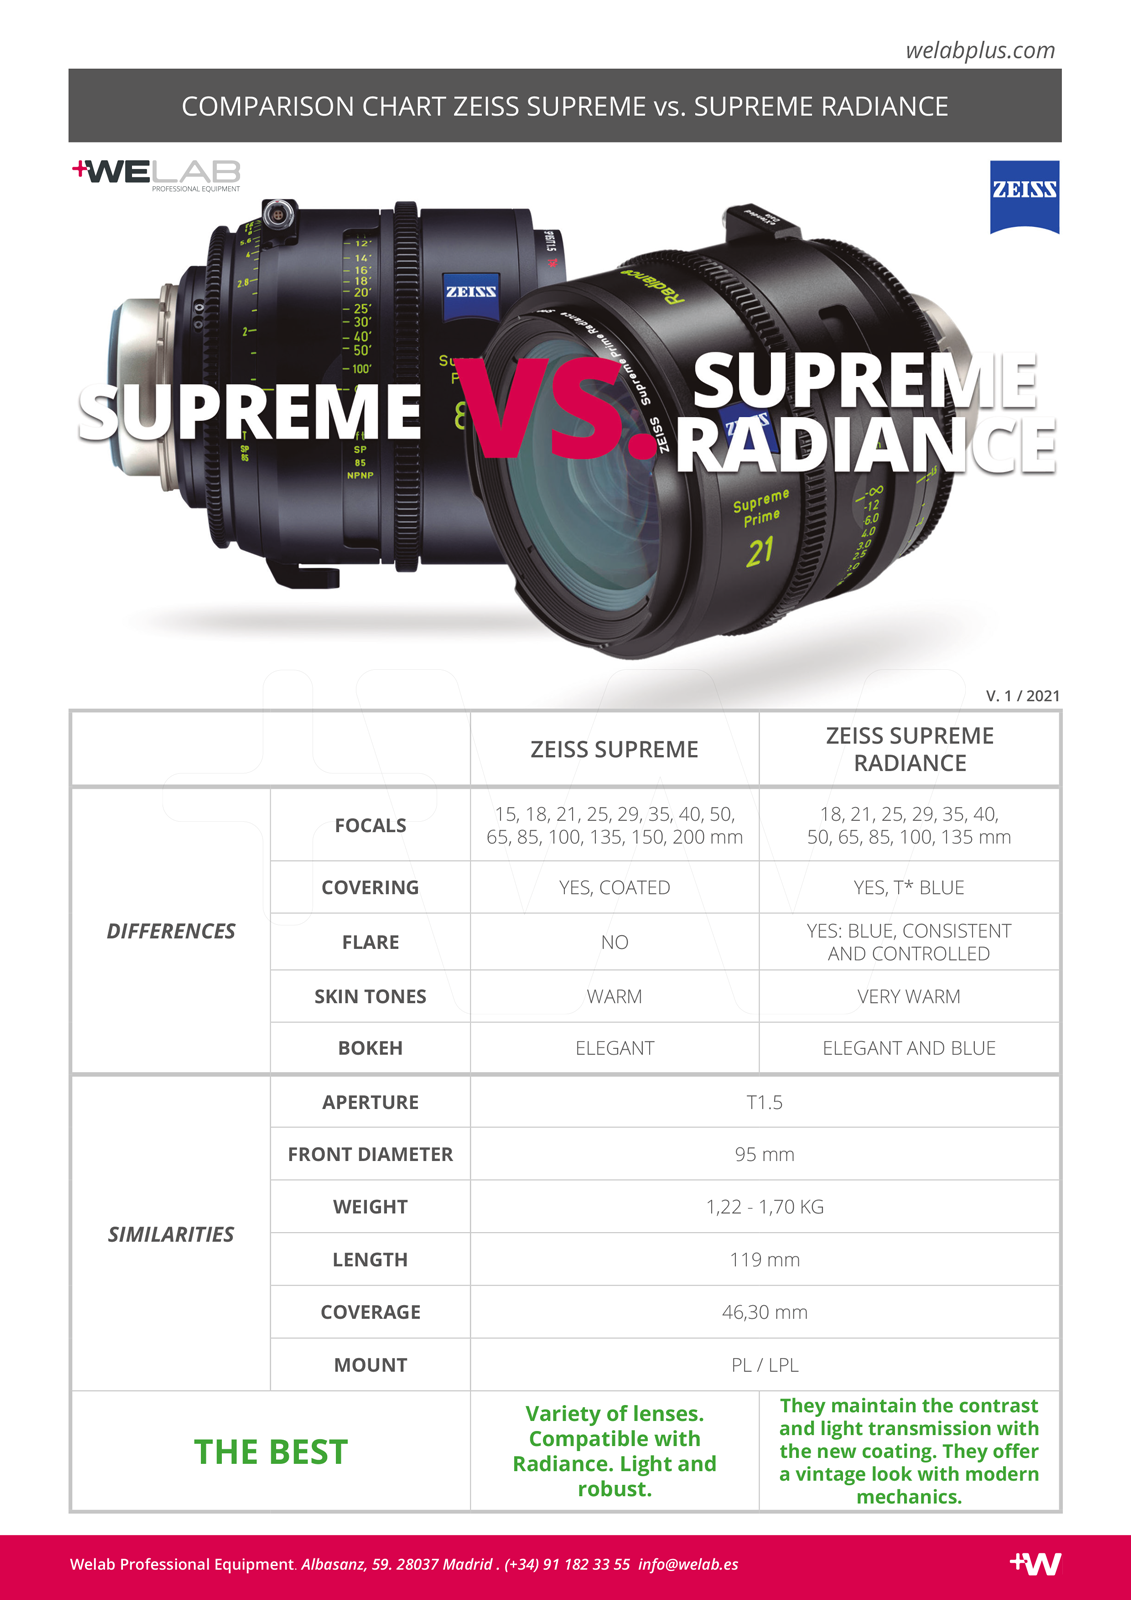 COMPARATIVA ZEISS SUPREME VS. SUPREME RADIANCE